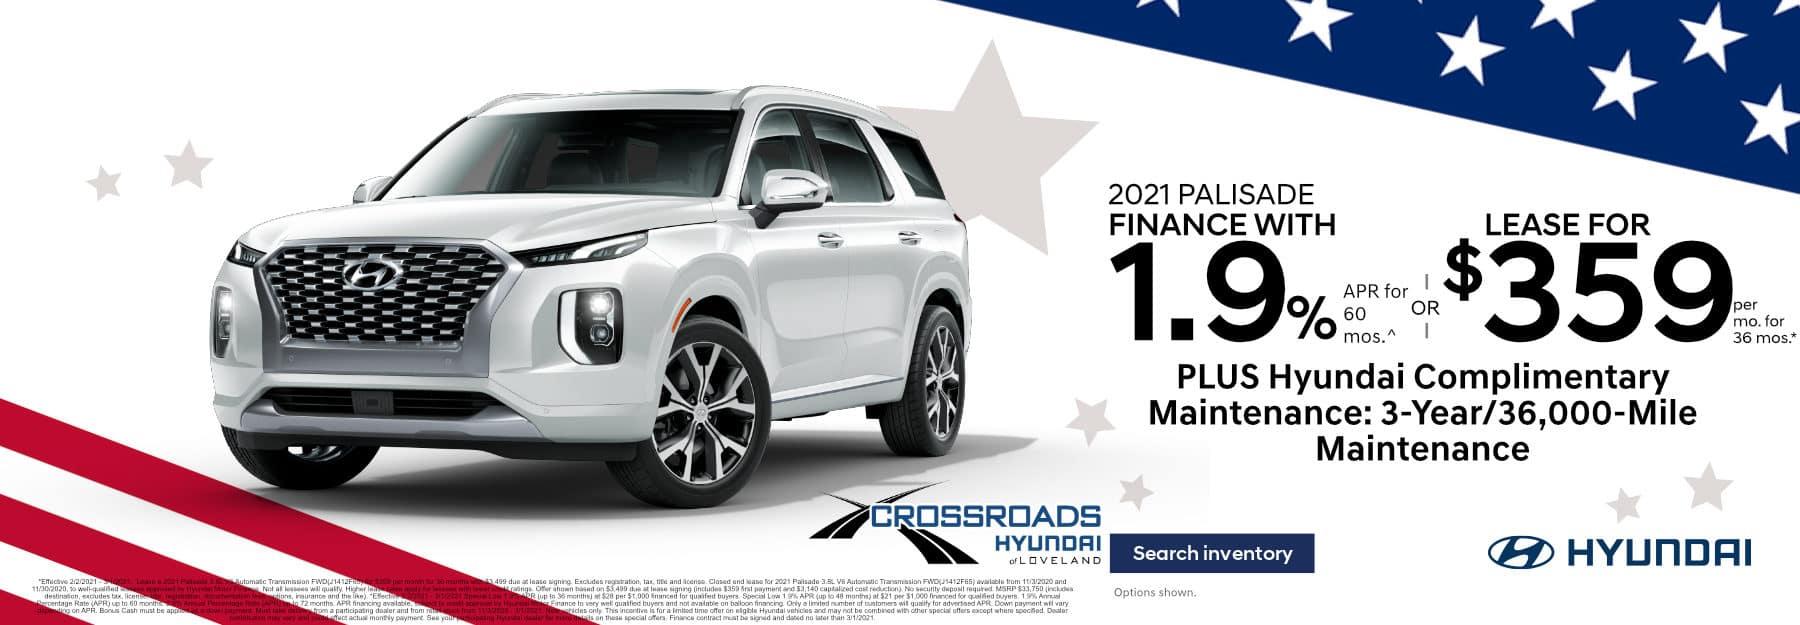 February_2021_PALISADE_Crossroads_Hyundai